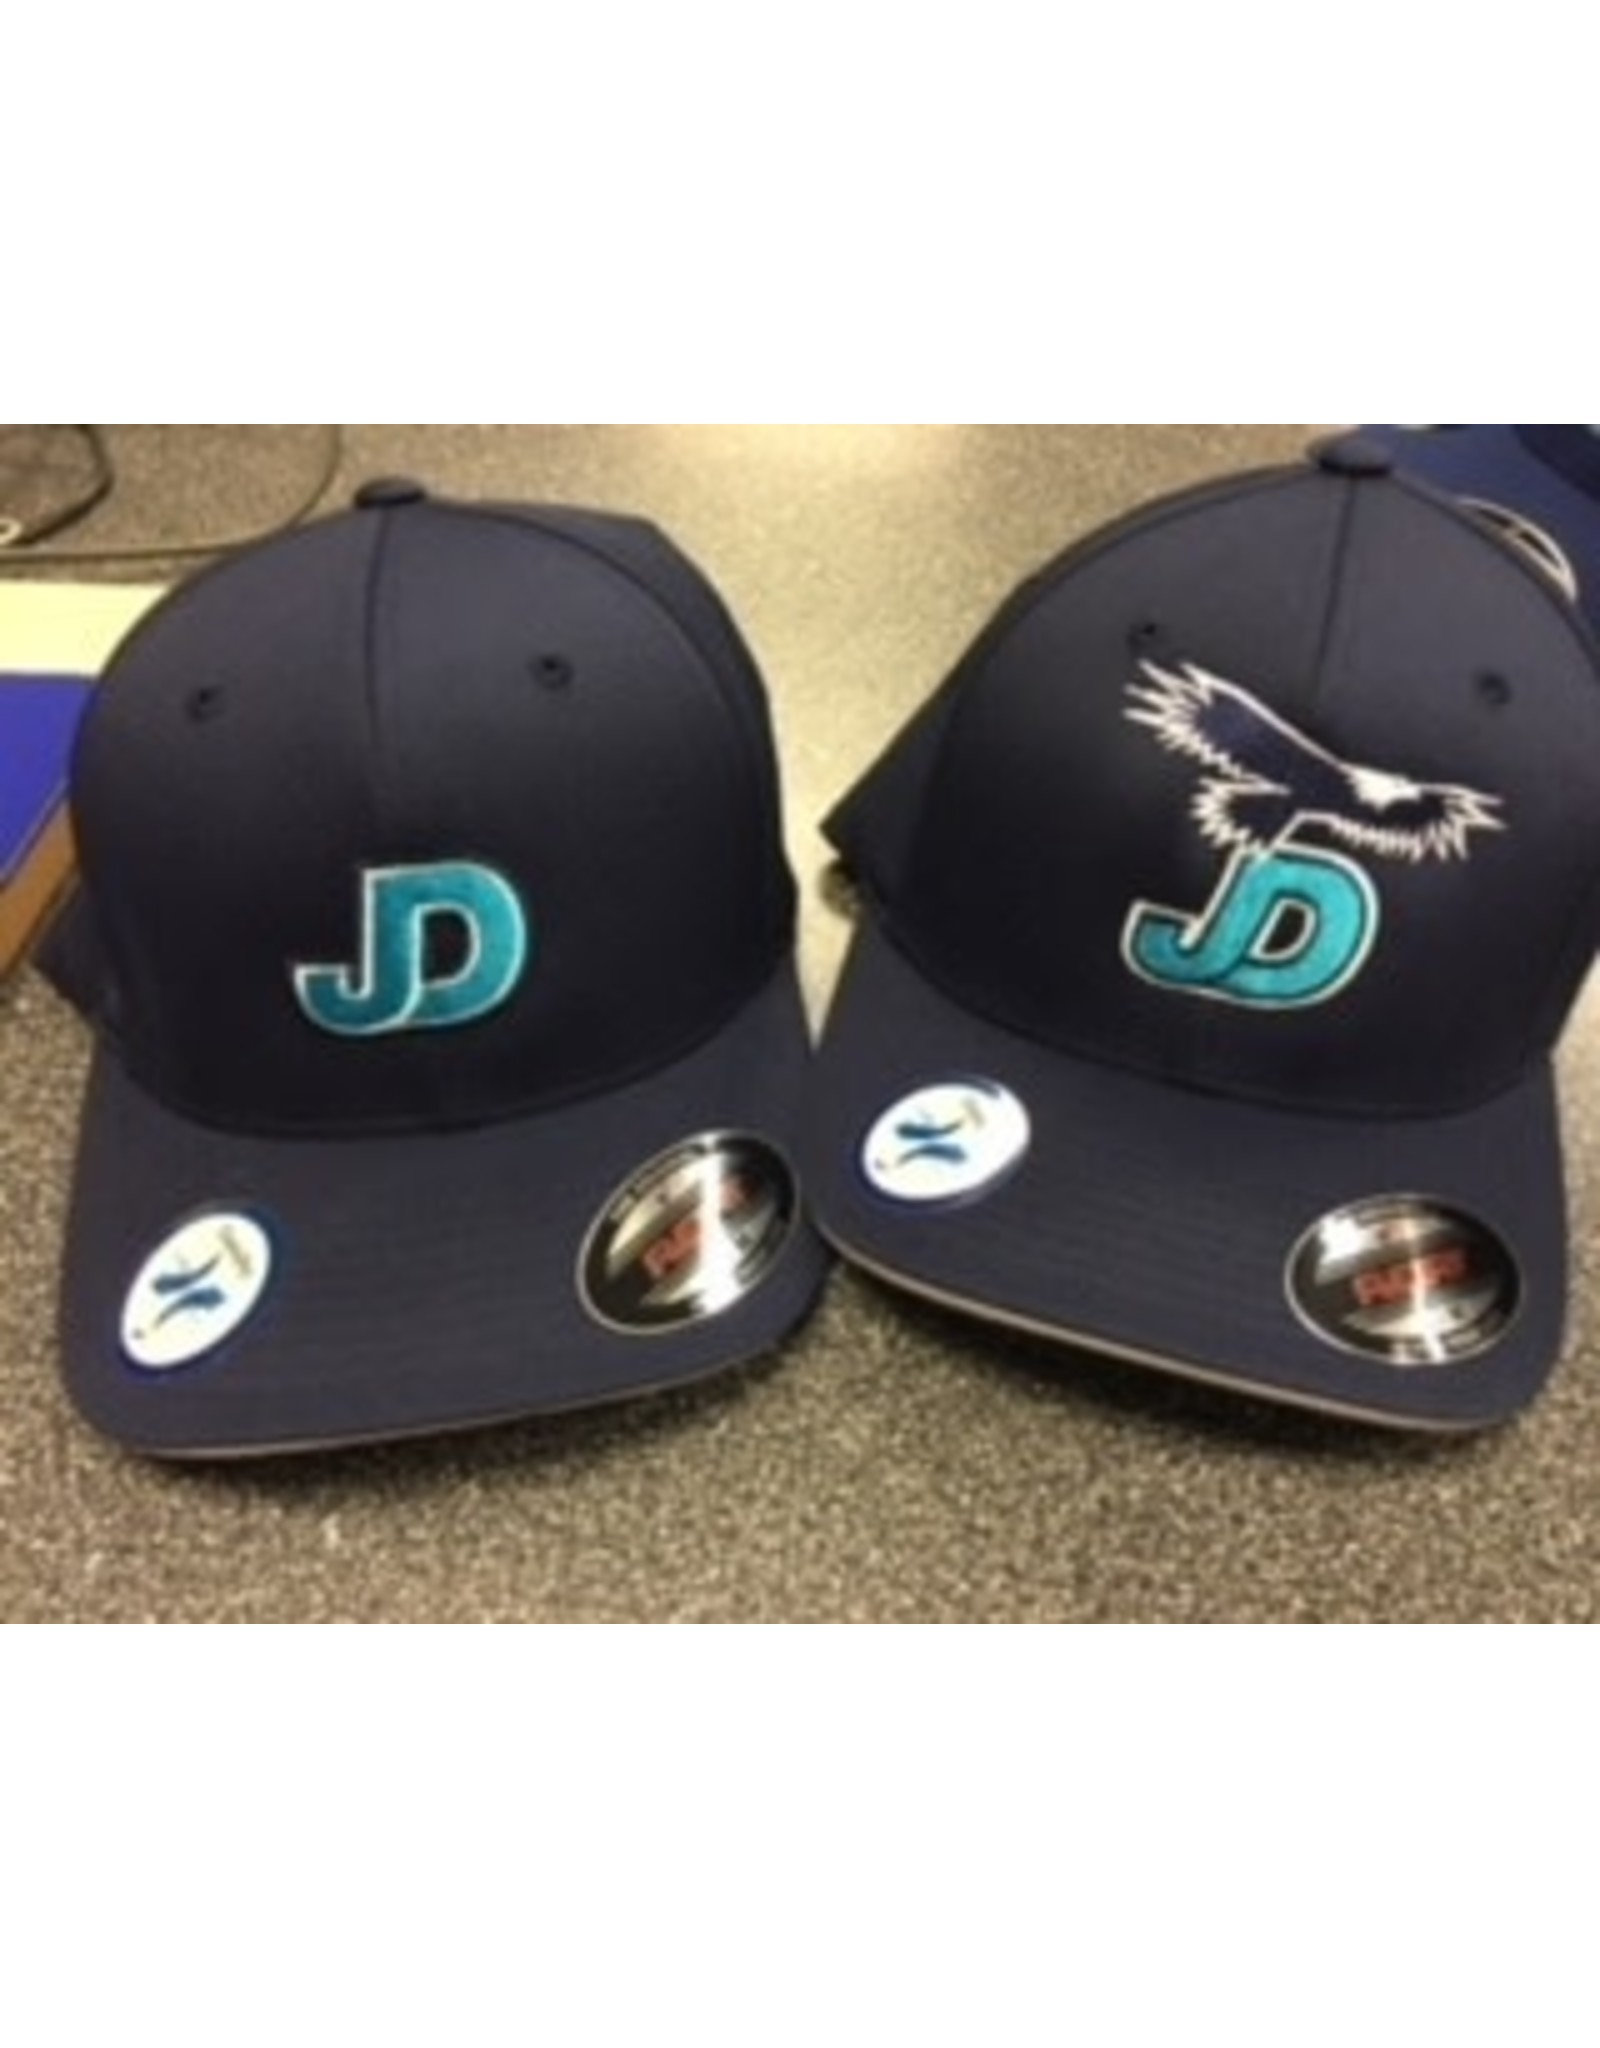 NON-UNIFORM JDS-Hats flex fit with or without eagle